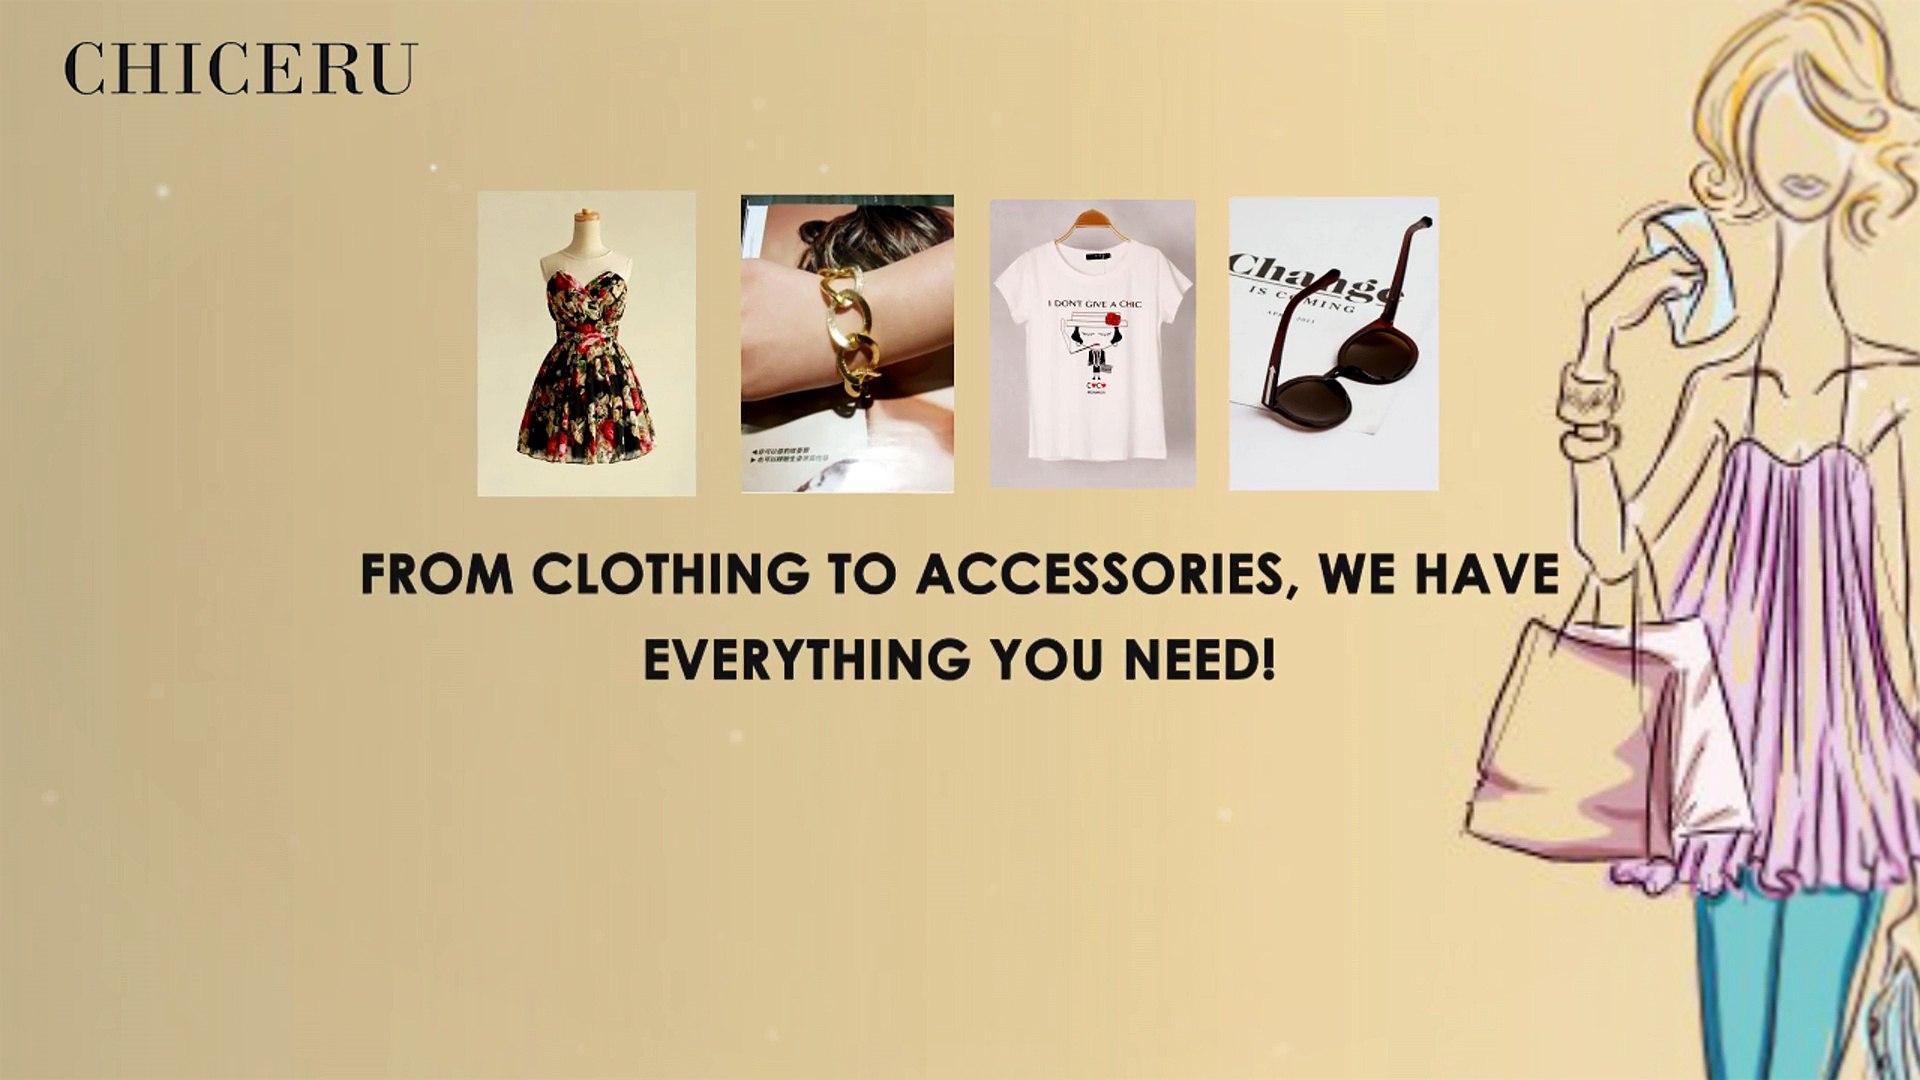 fashion cloth online | online fashion | chiceru.com